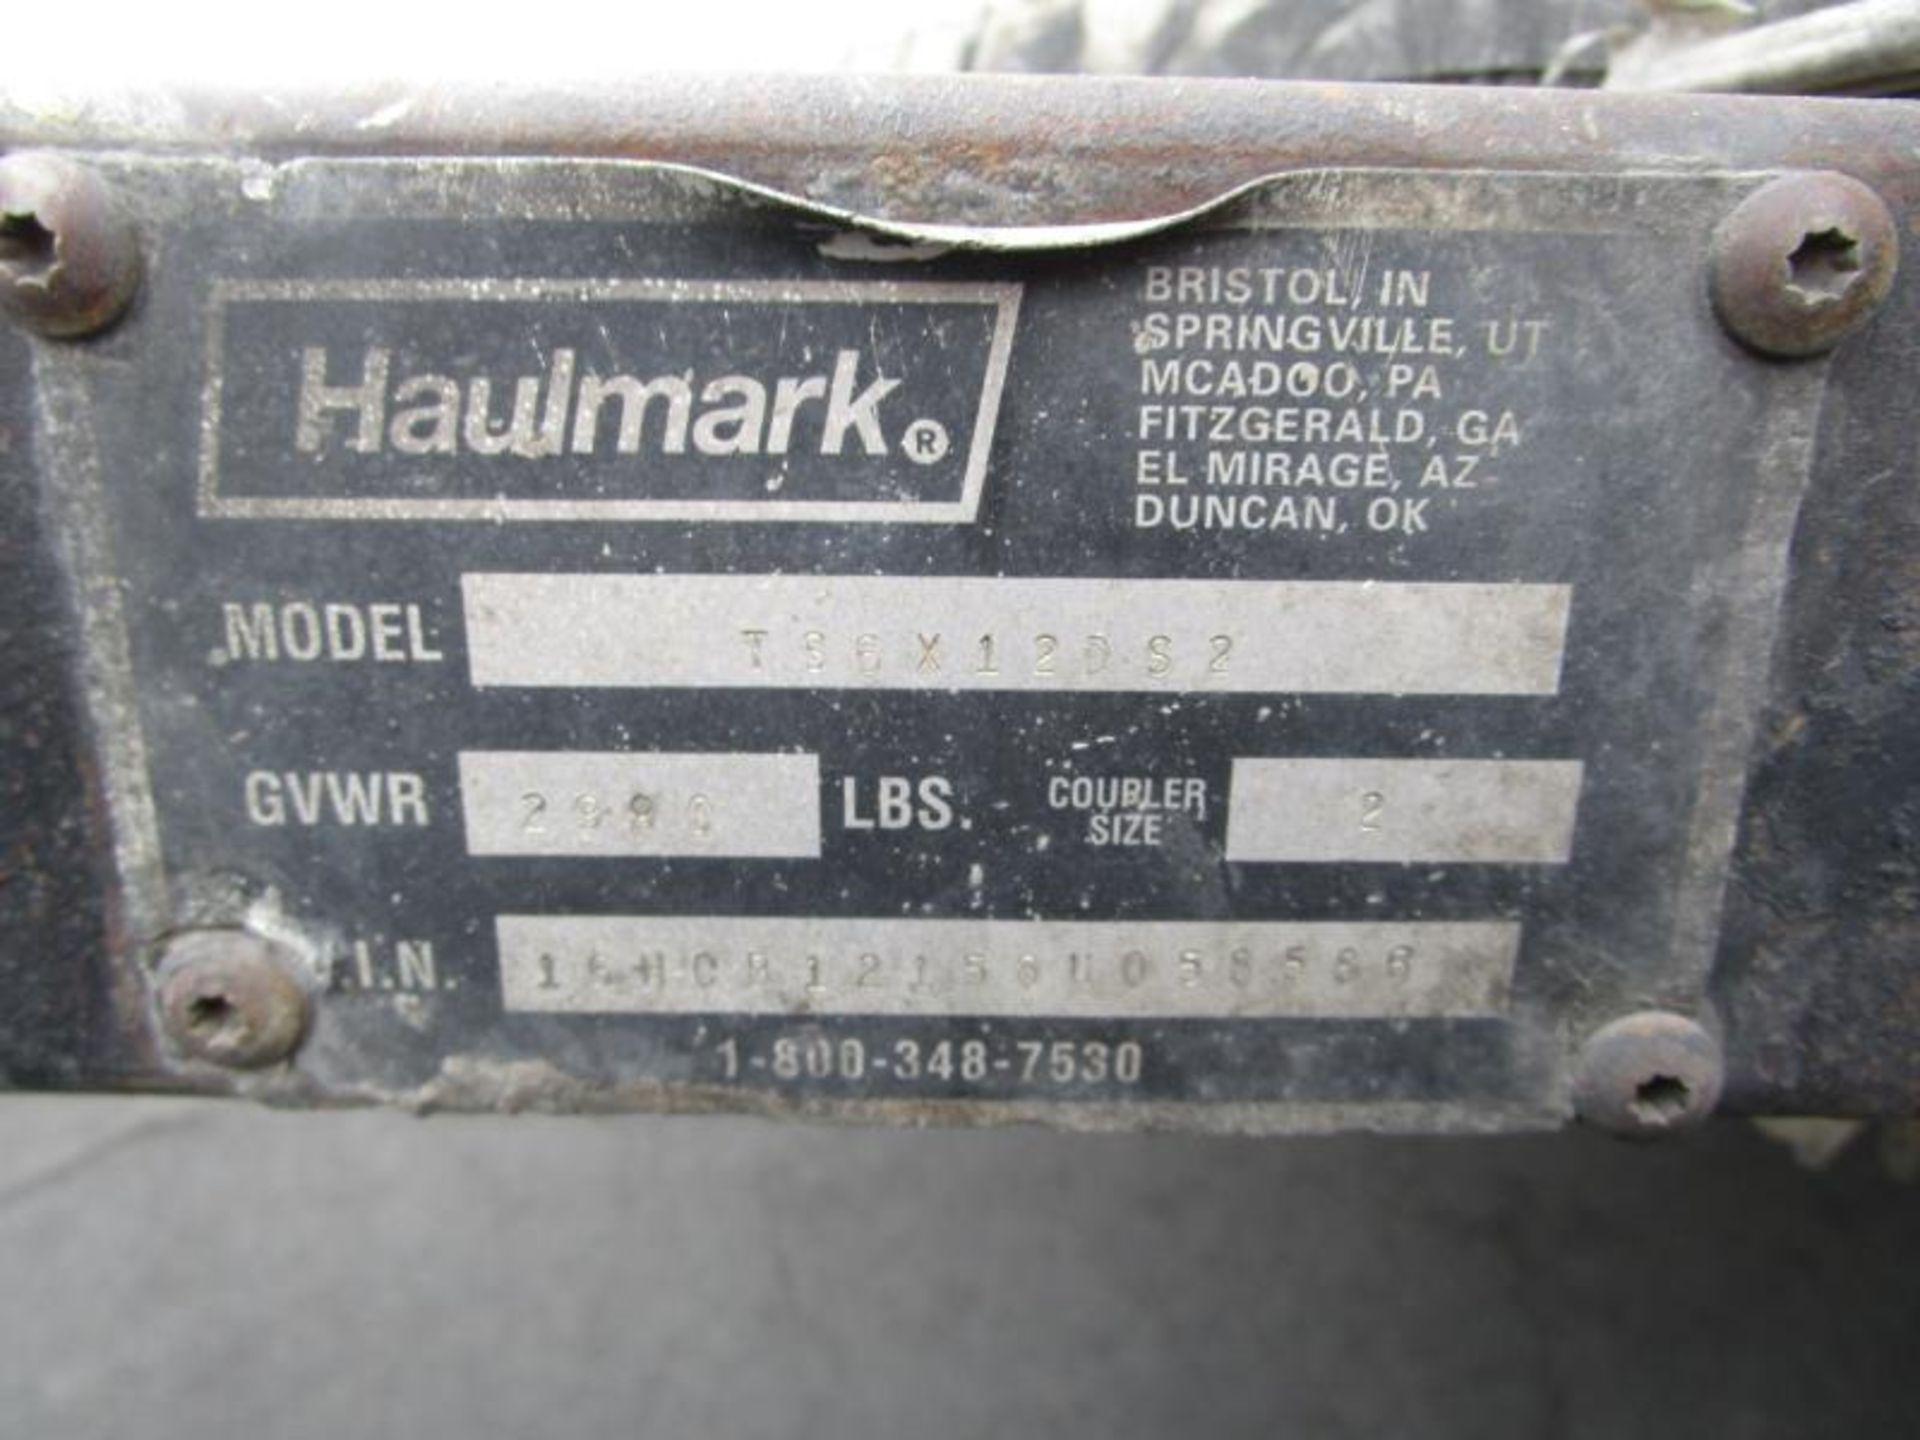 "Lot 32 - 2008 Trailer, 6' x 12' by Hualmark, Utility Body, 1,980lbs GWVR, 2"" Ball, Model: TS6X12DS2, VIN:"